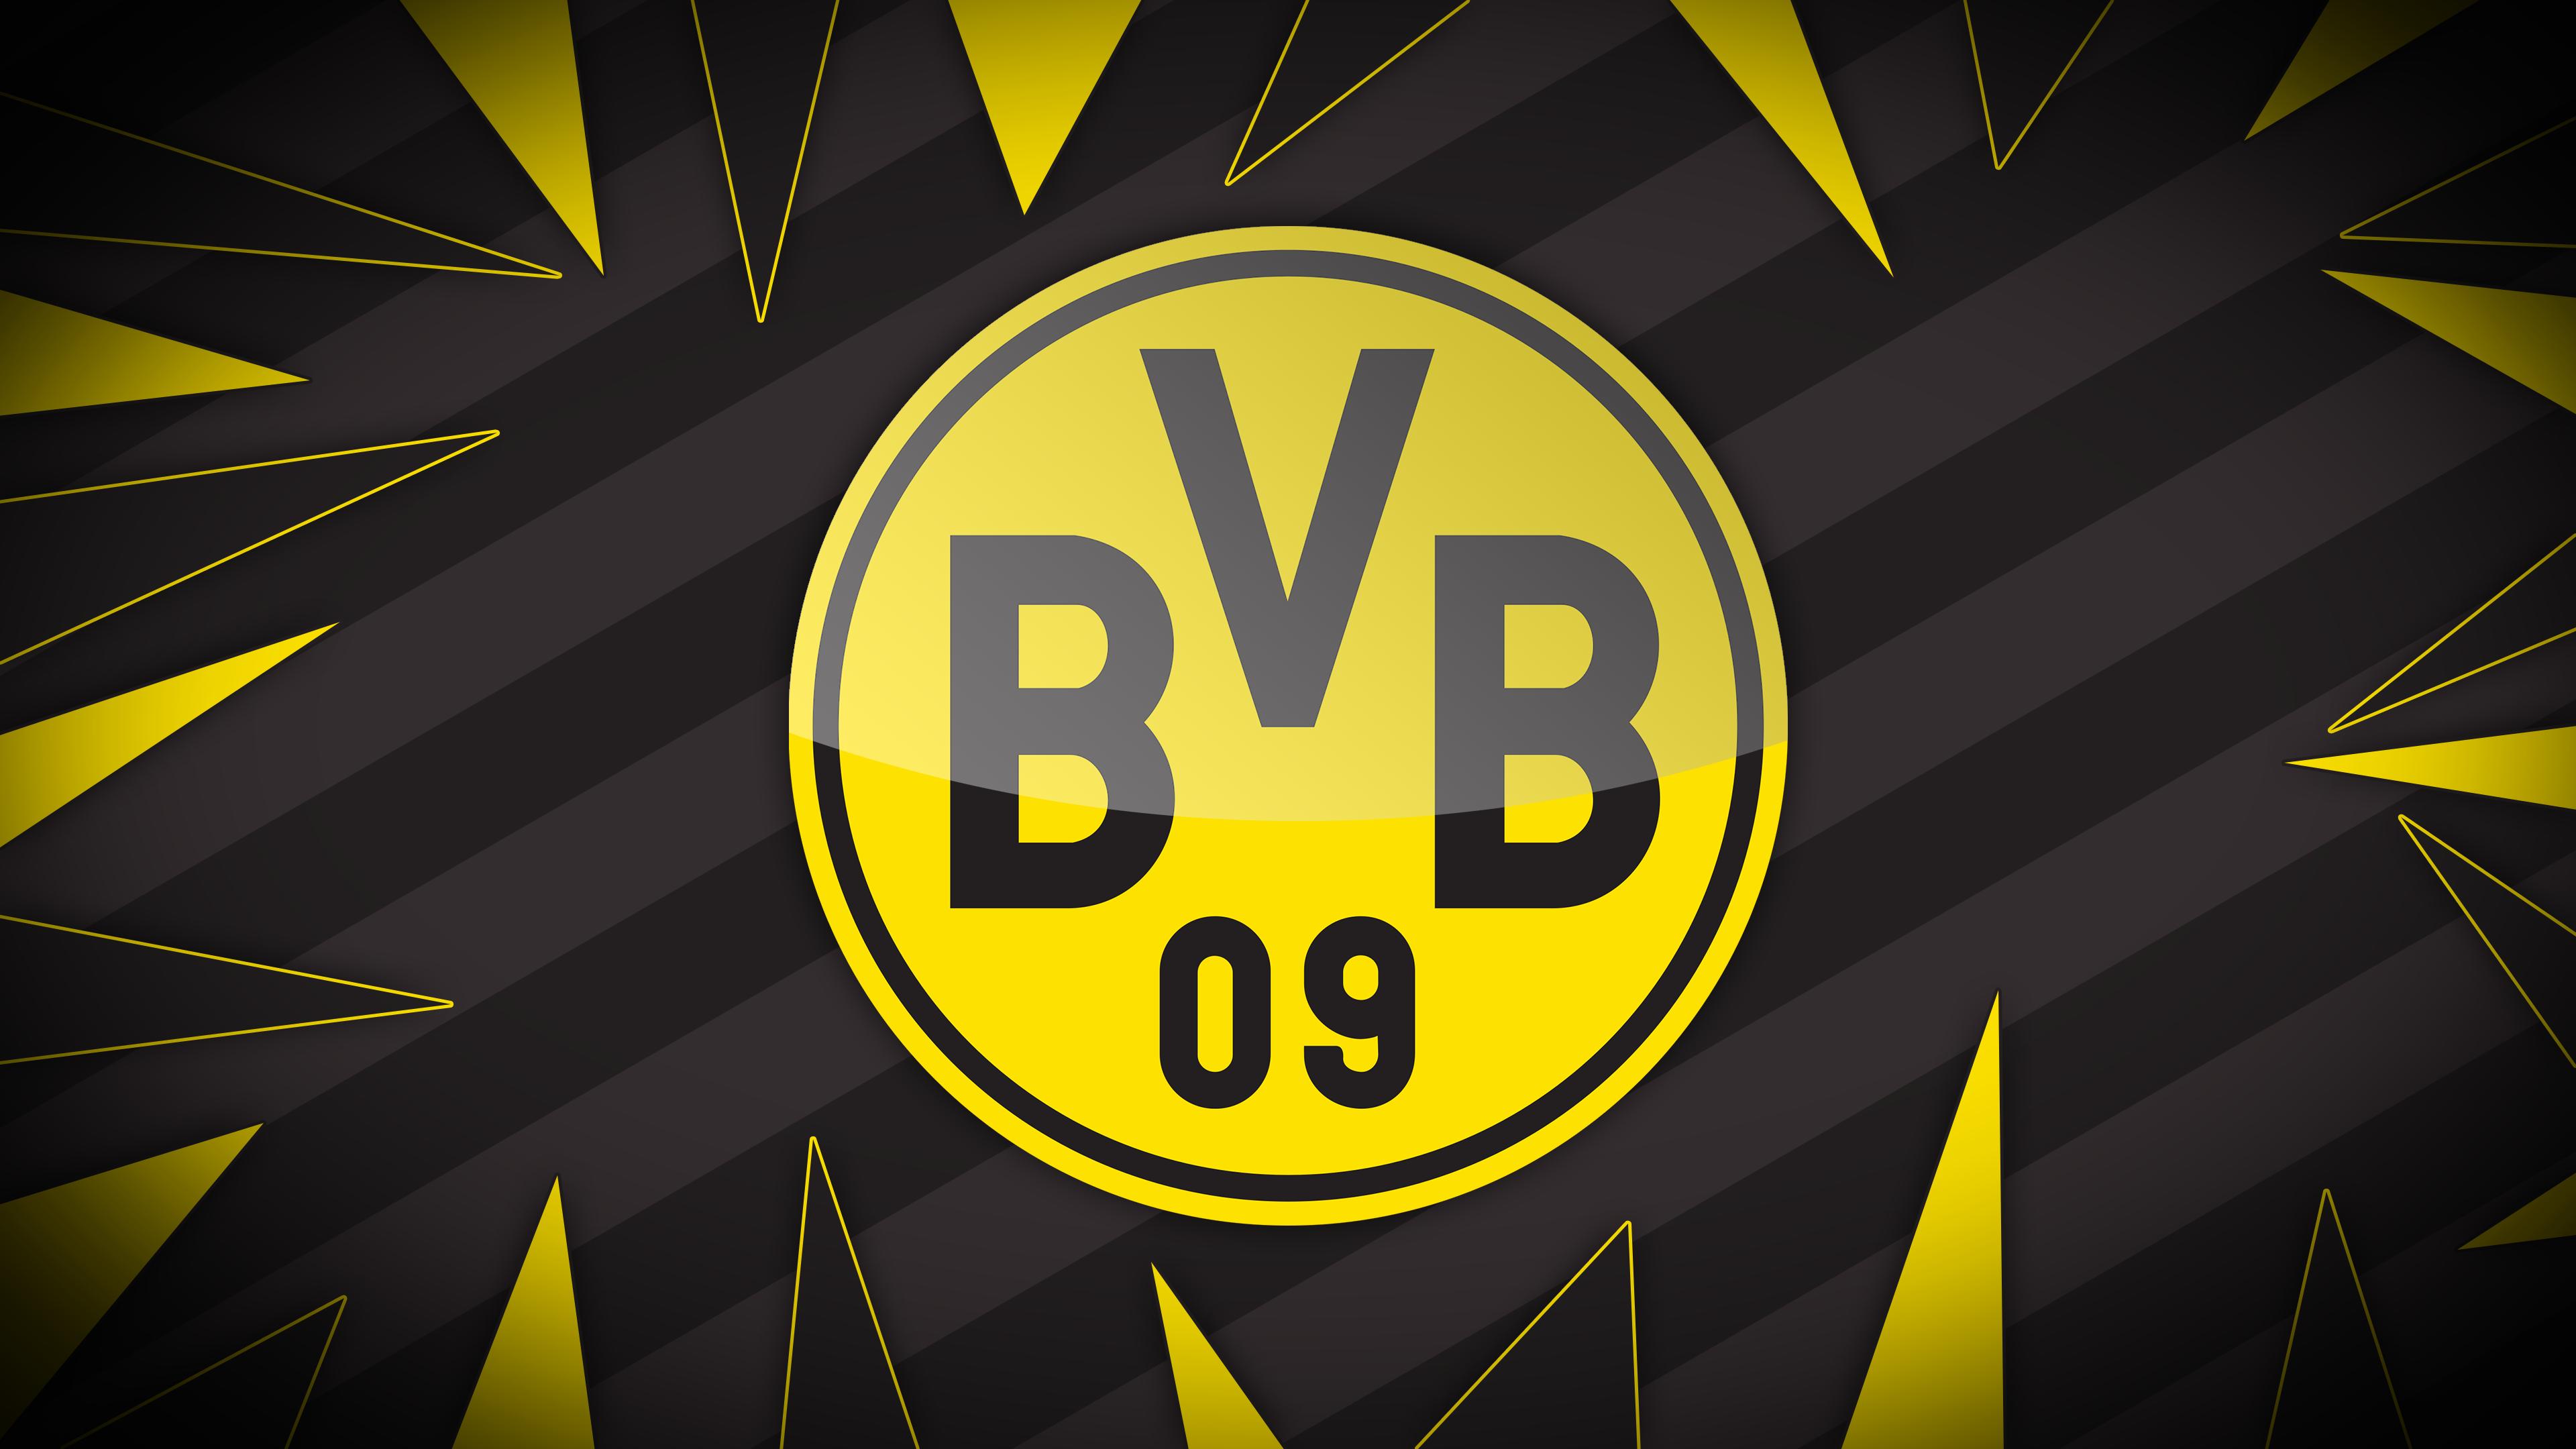 5048023 3840x2160 Logo, Soccer, BVB, Emblem, Borussia Dortmund.